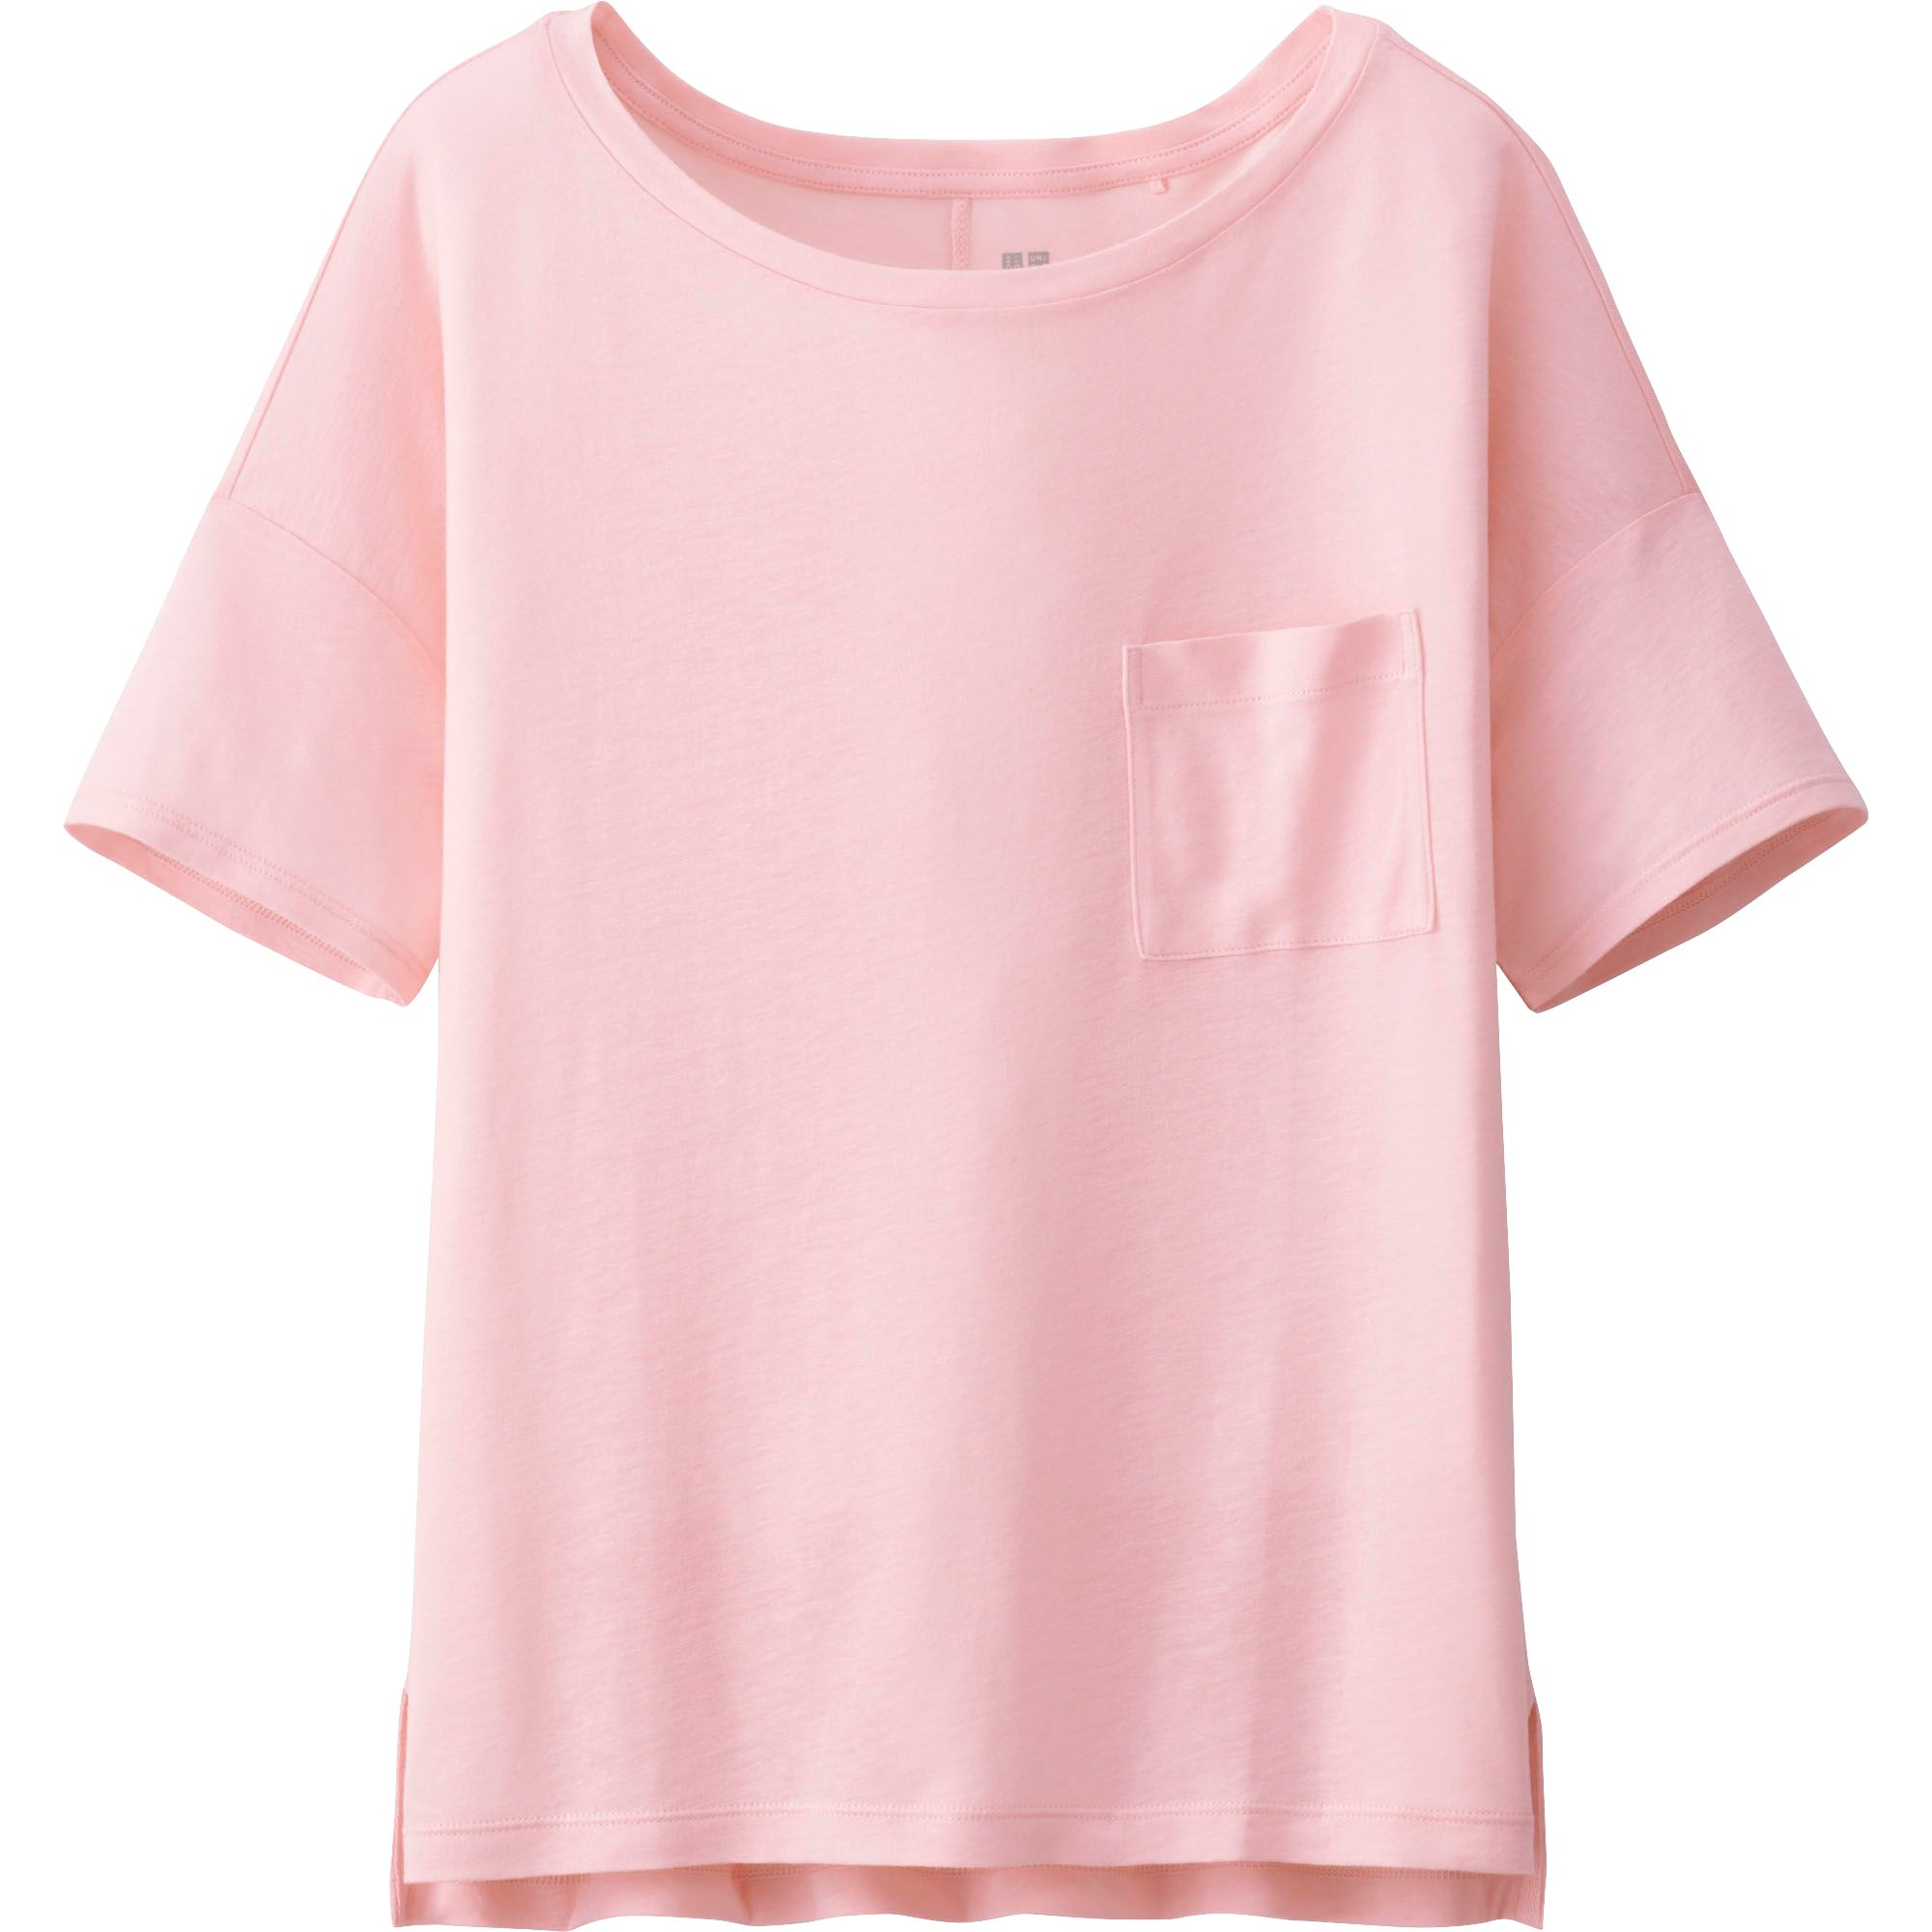 Uniqlo women modal linen short sleeve boxy t shirt in pink for Short sleeve linen shirt